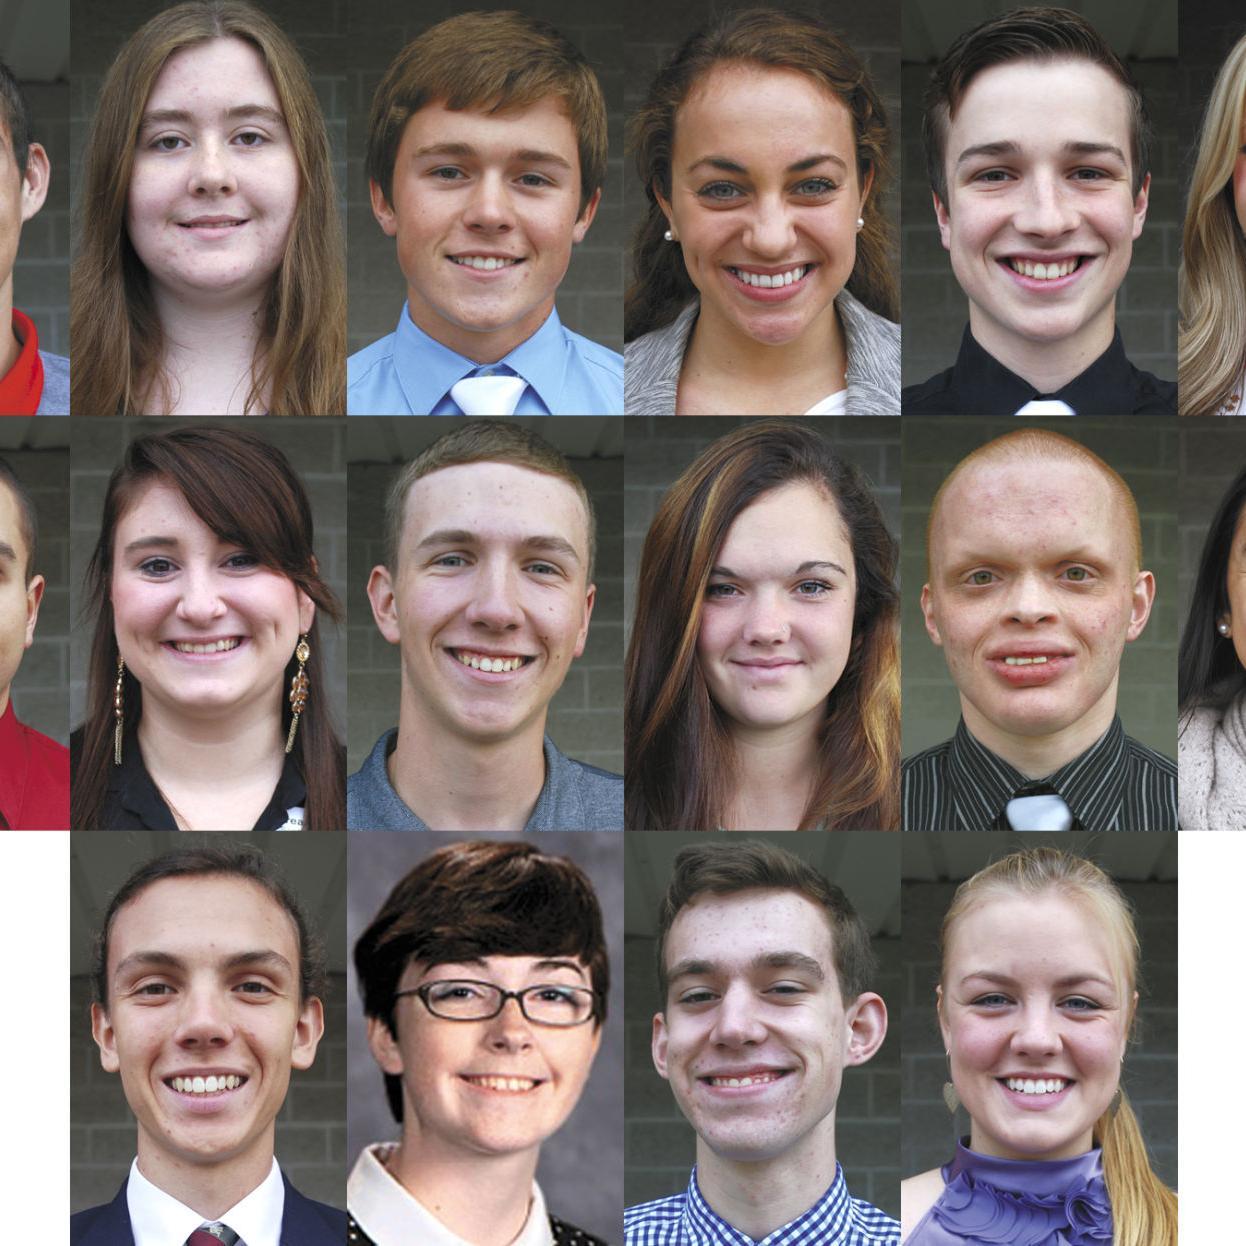 Meet the 2014 Junior First Citizen nominees | Local